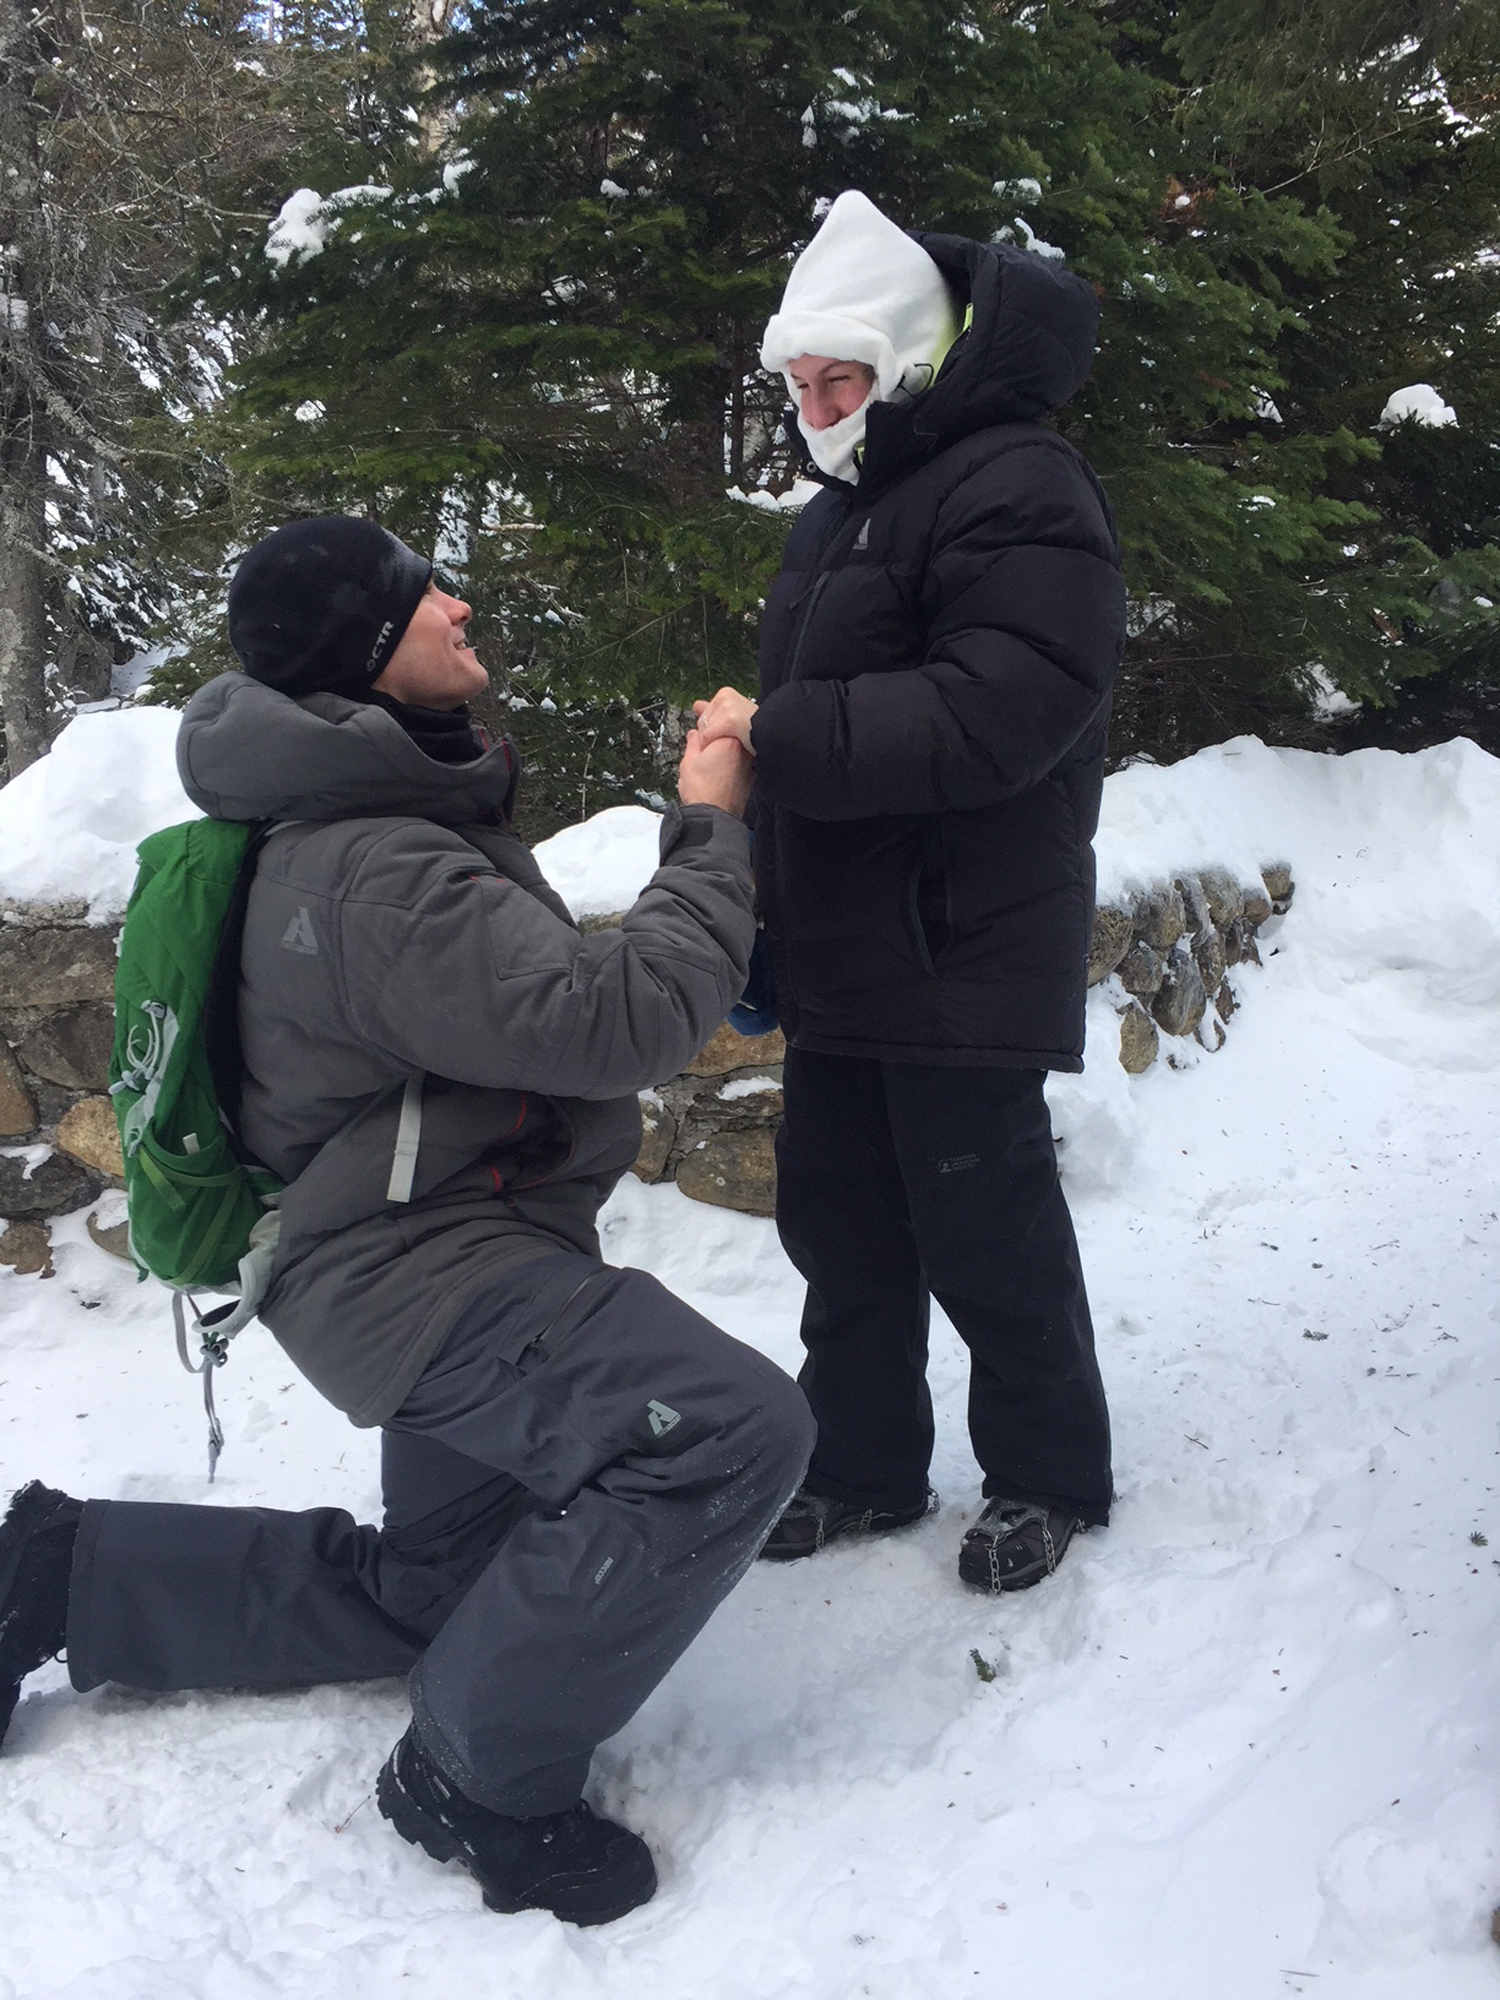 Warm hearts, subzero temps: Couple gets engaged on mountain